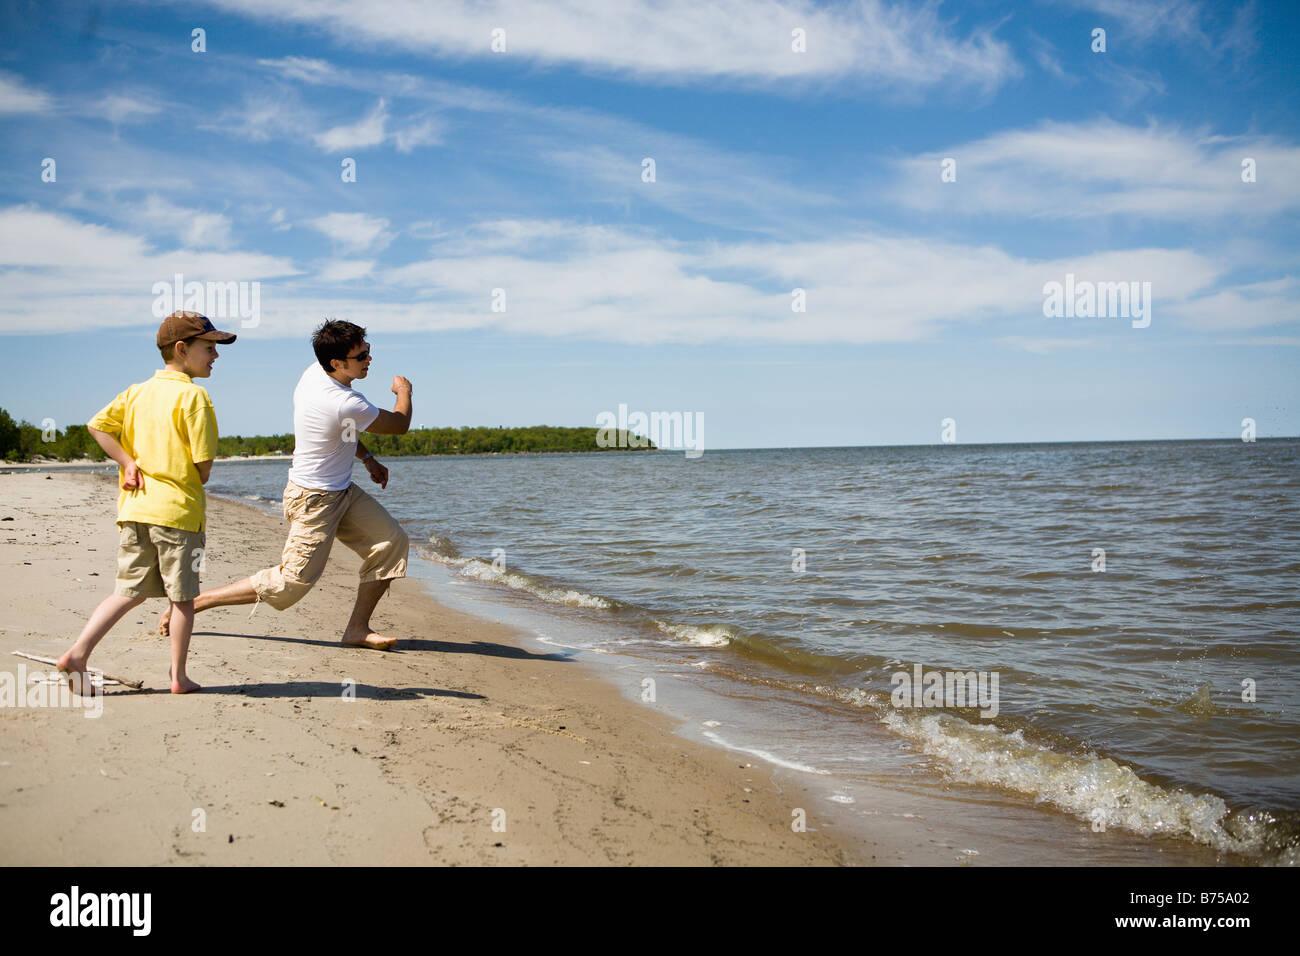 Man and boy (7) skipping stones, Grand Beach Provincial Park, Manitoba, Canada - Stock Image